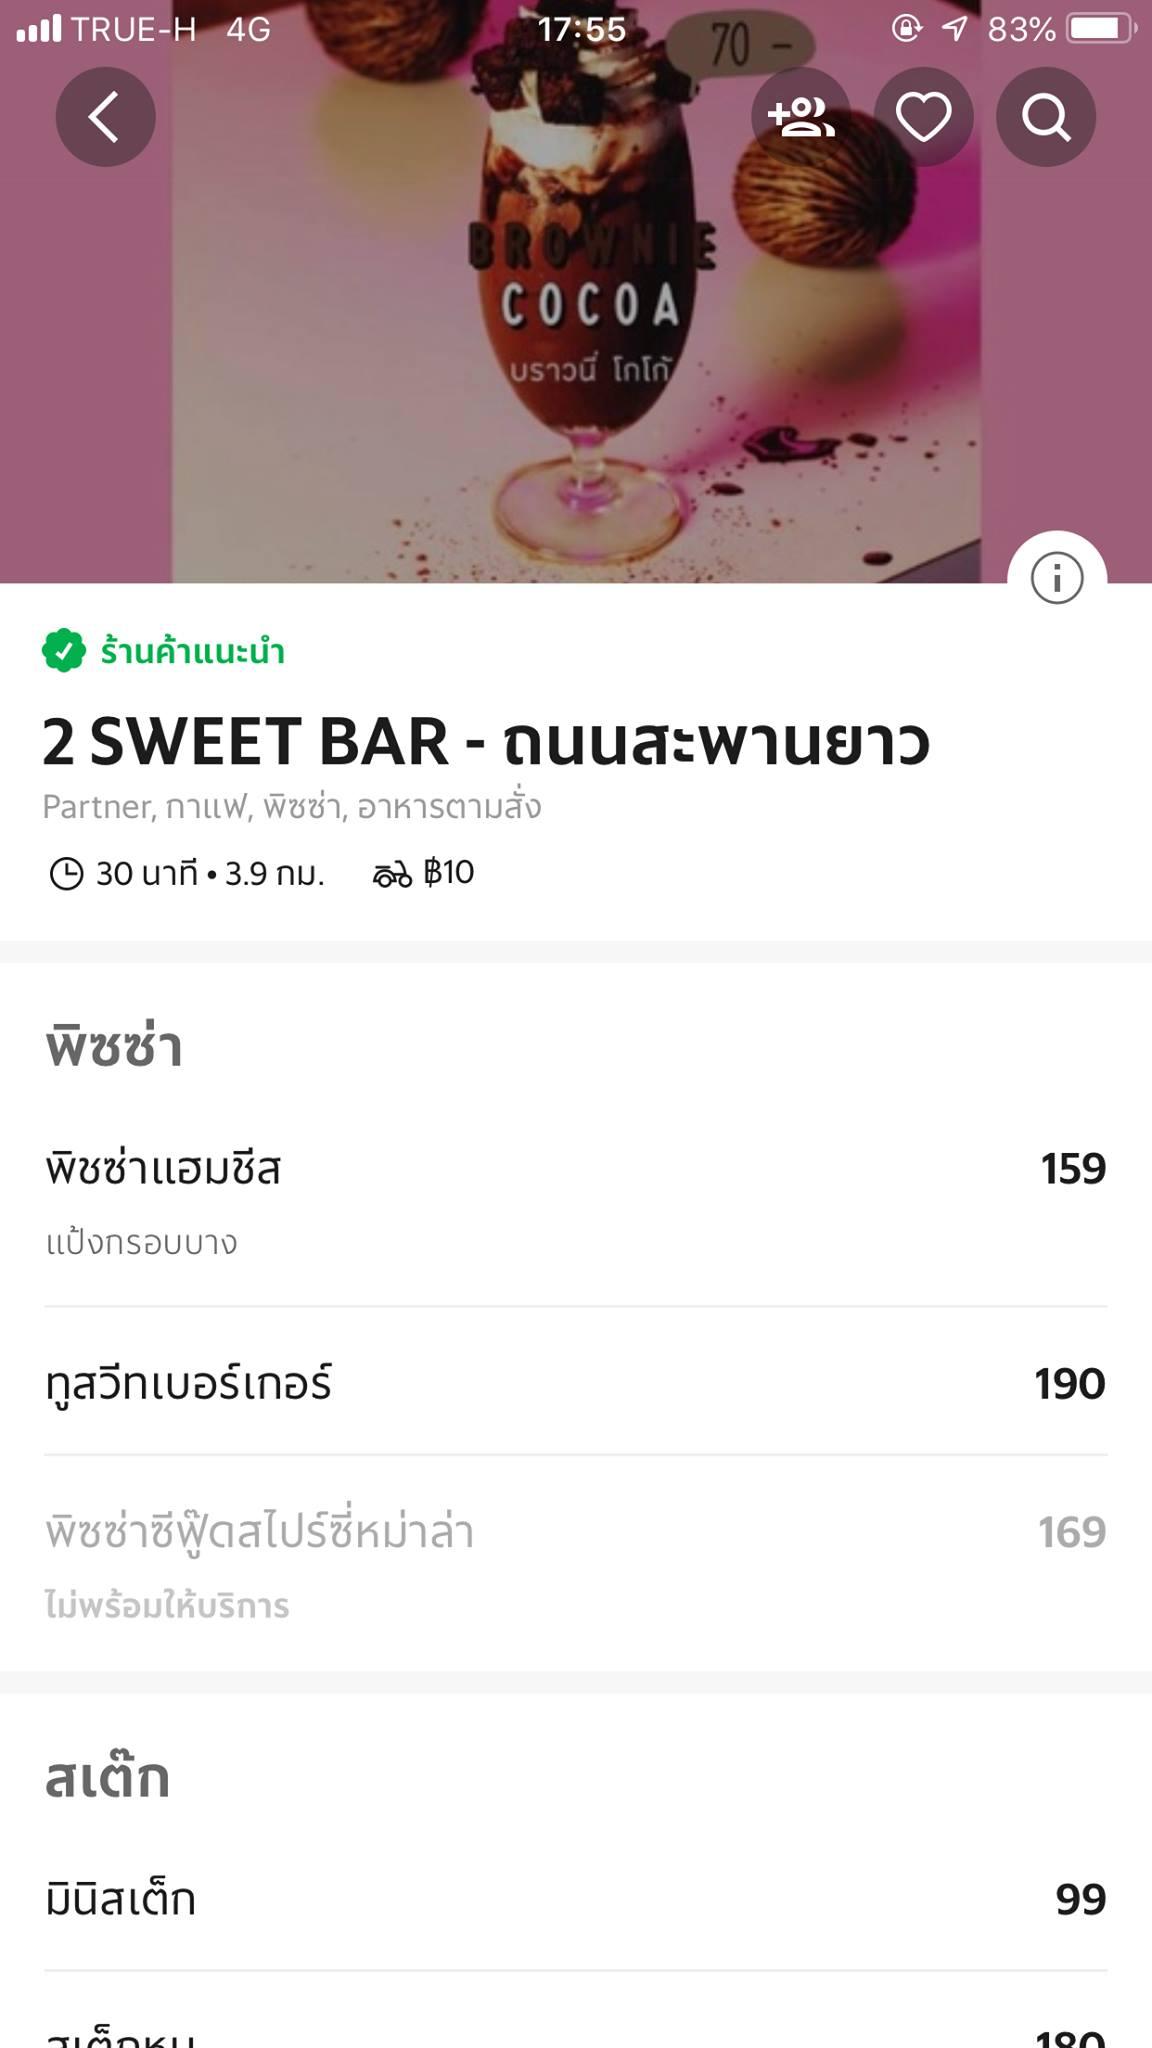 10. 2Sweer Bar เด็ดจริงเรื่องเครื่องดื่ม มัจฉะ โกโก้ แอดสั่งกินบ่อยแถมราคาไม่แพงด้วยเน้ออgrabfood,อร่อย,ของกิน,นครศรี,Delivery